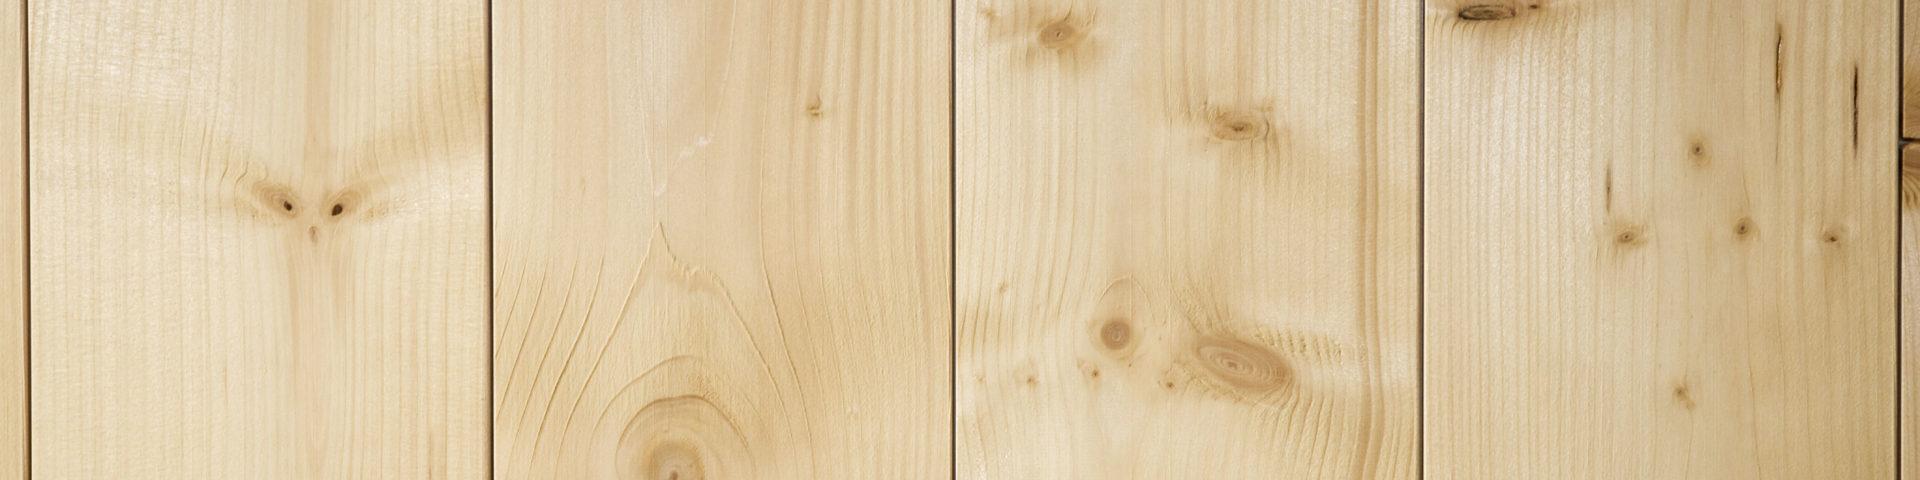 technische informationen: massivholzelemente wand, decke, dach